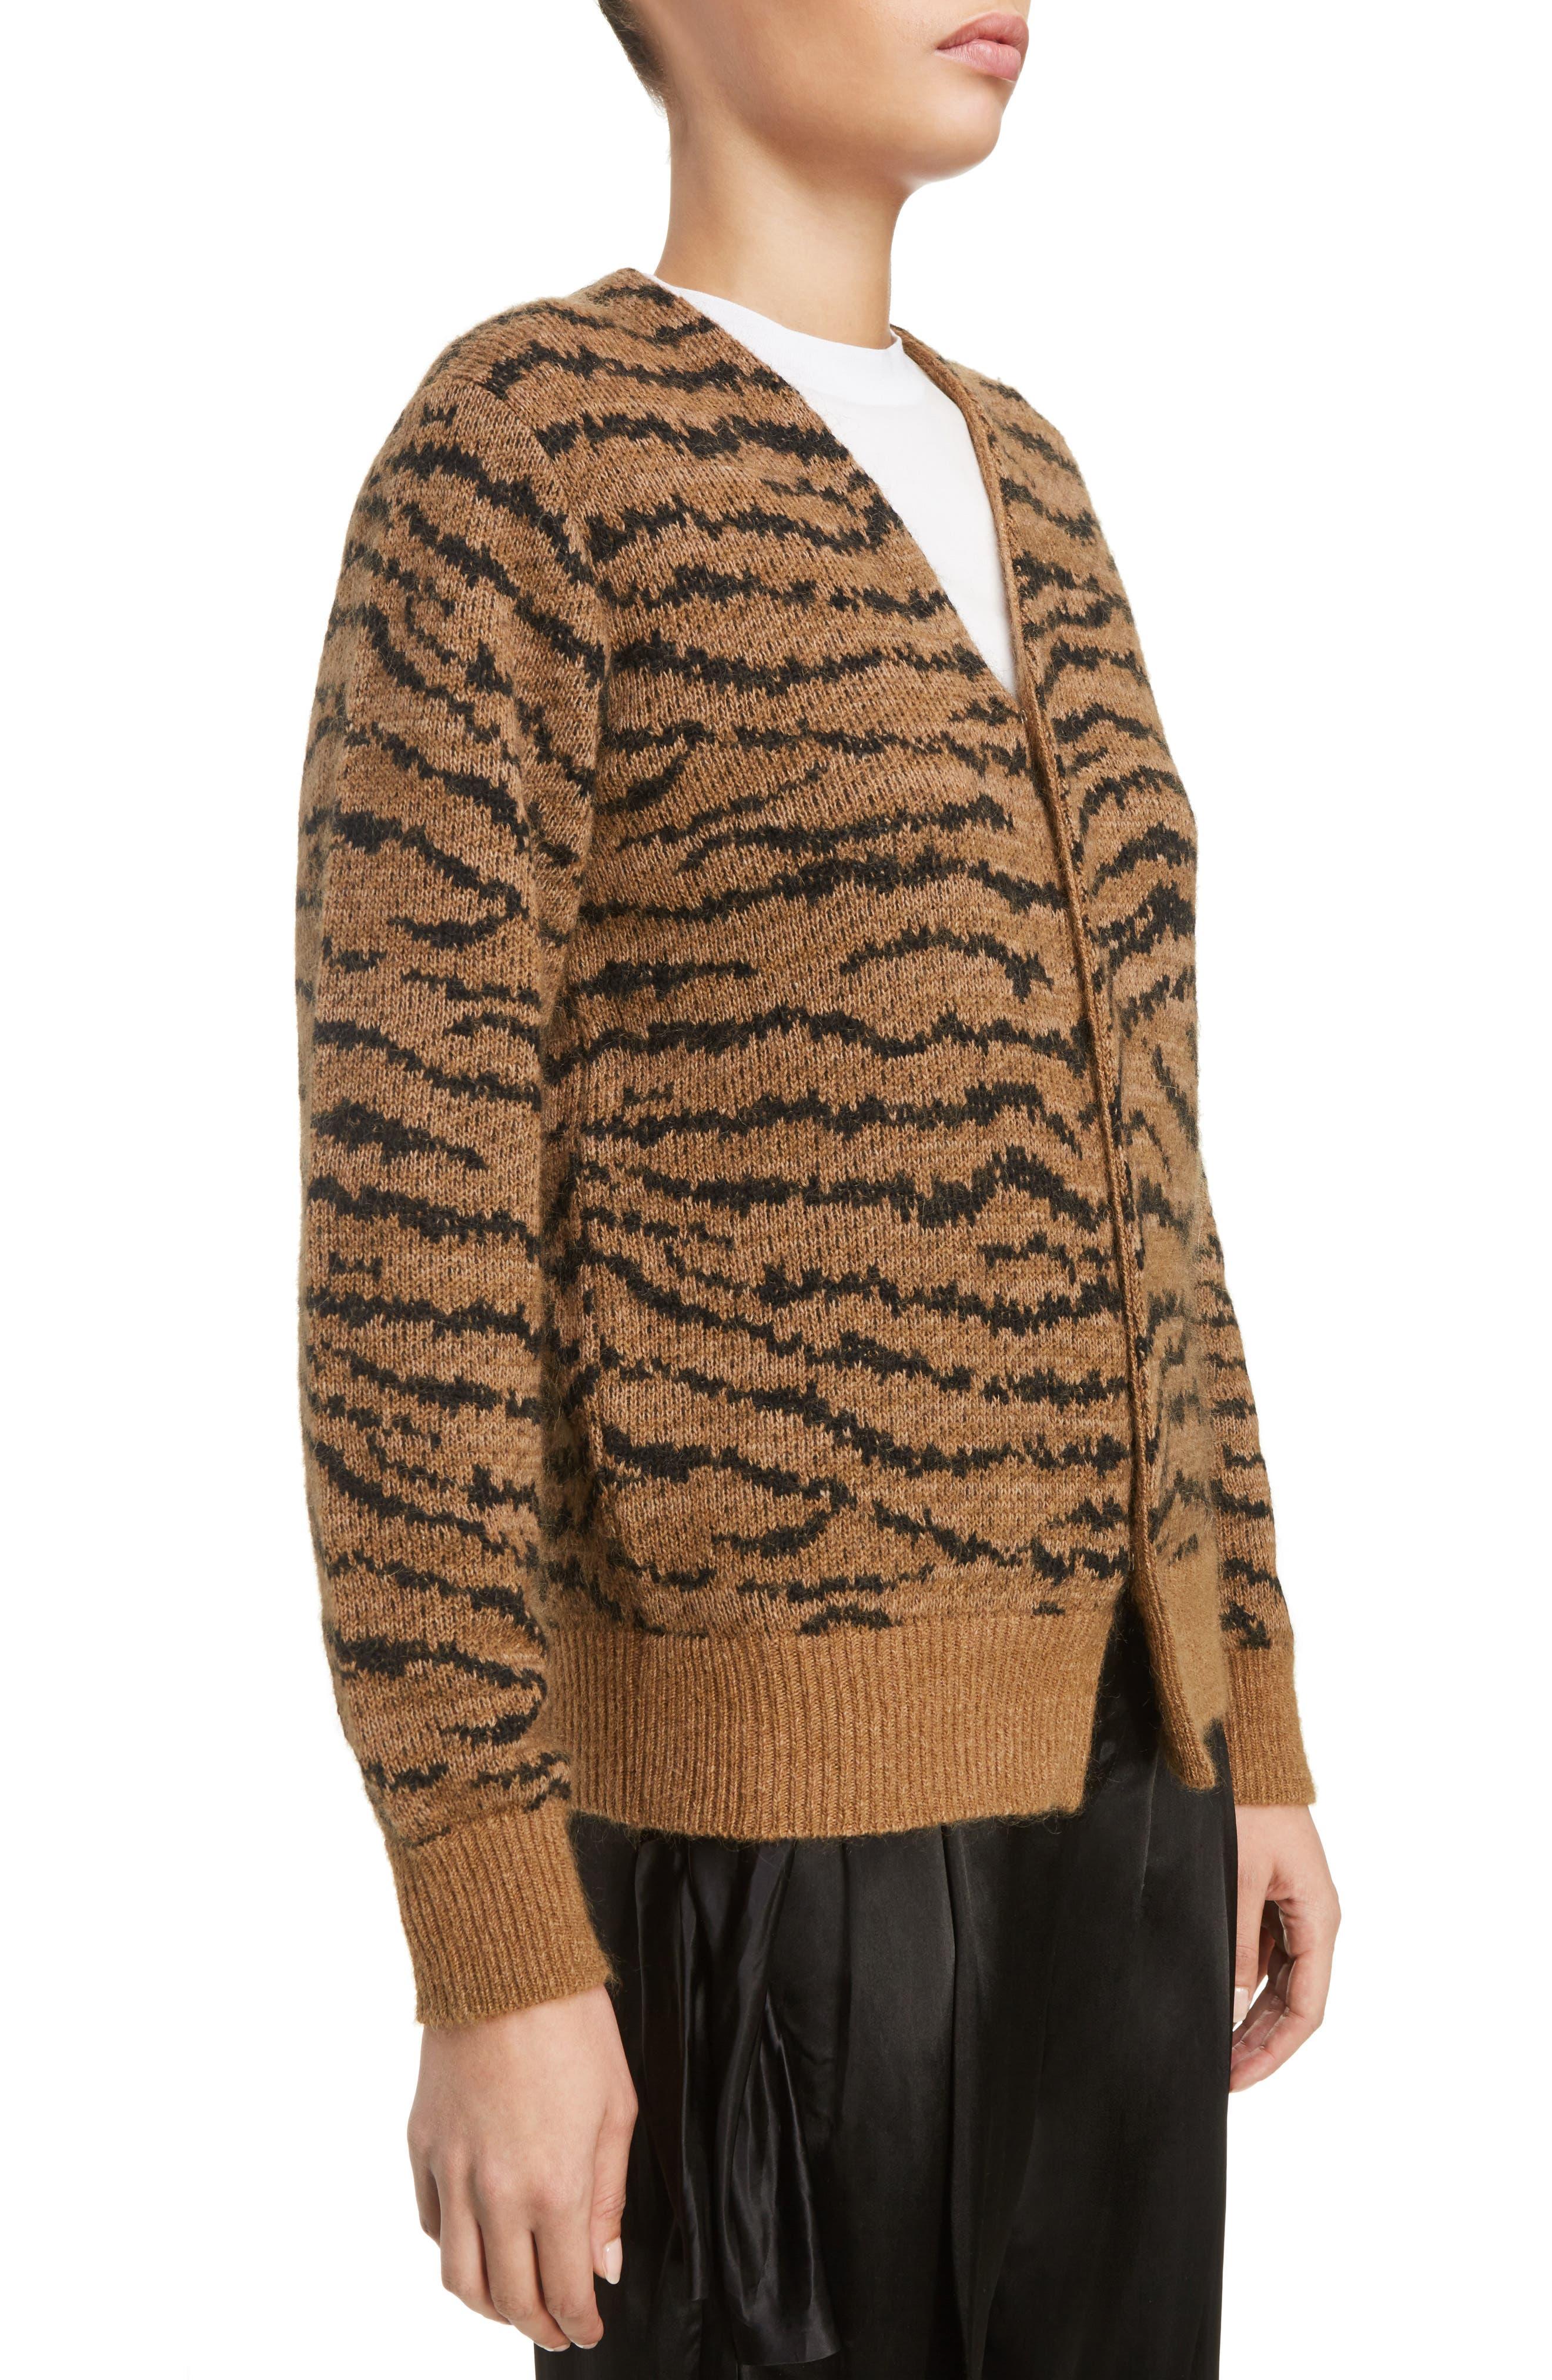 Tiger Jacquard Knit Button Cardigan,                             Alternate thumbnail 4, color,                             250